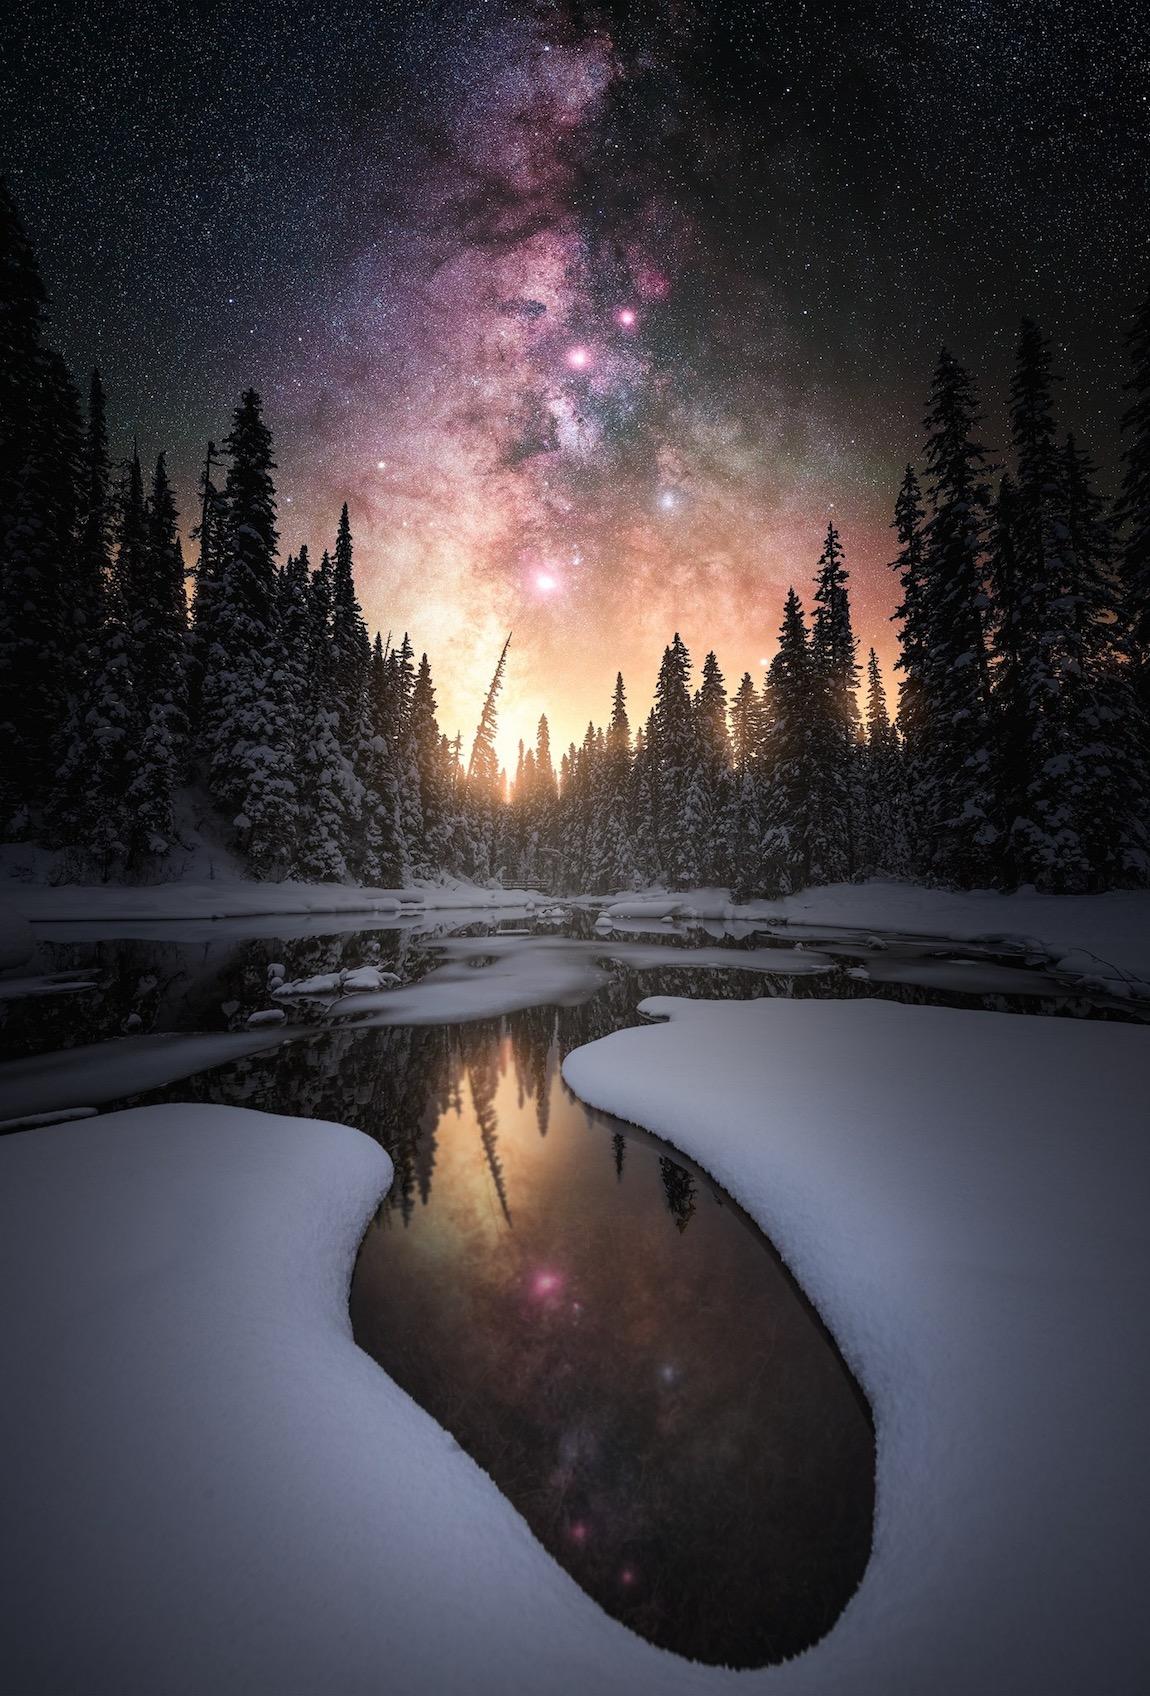 night-landscape-photography-6